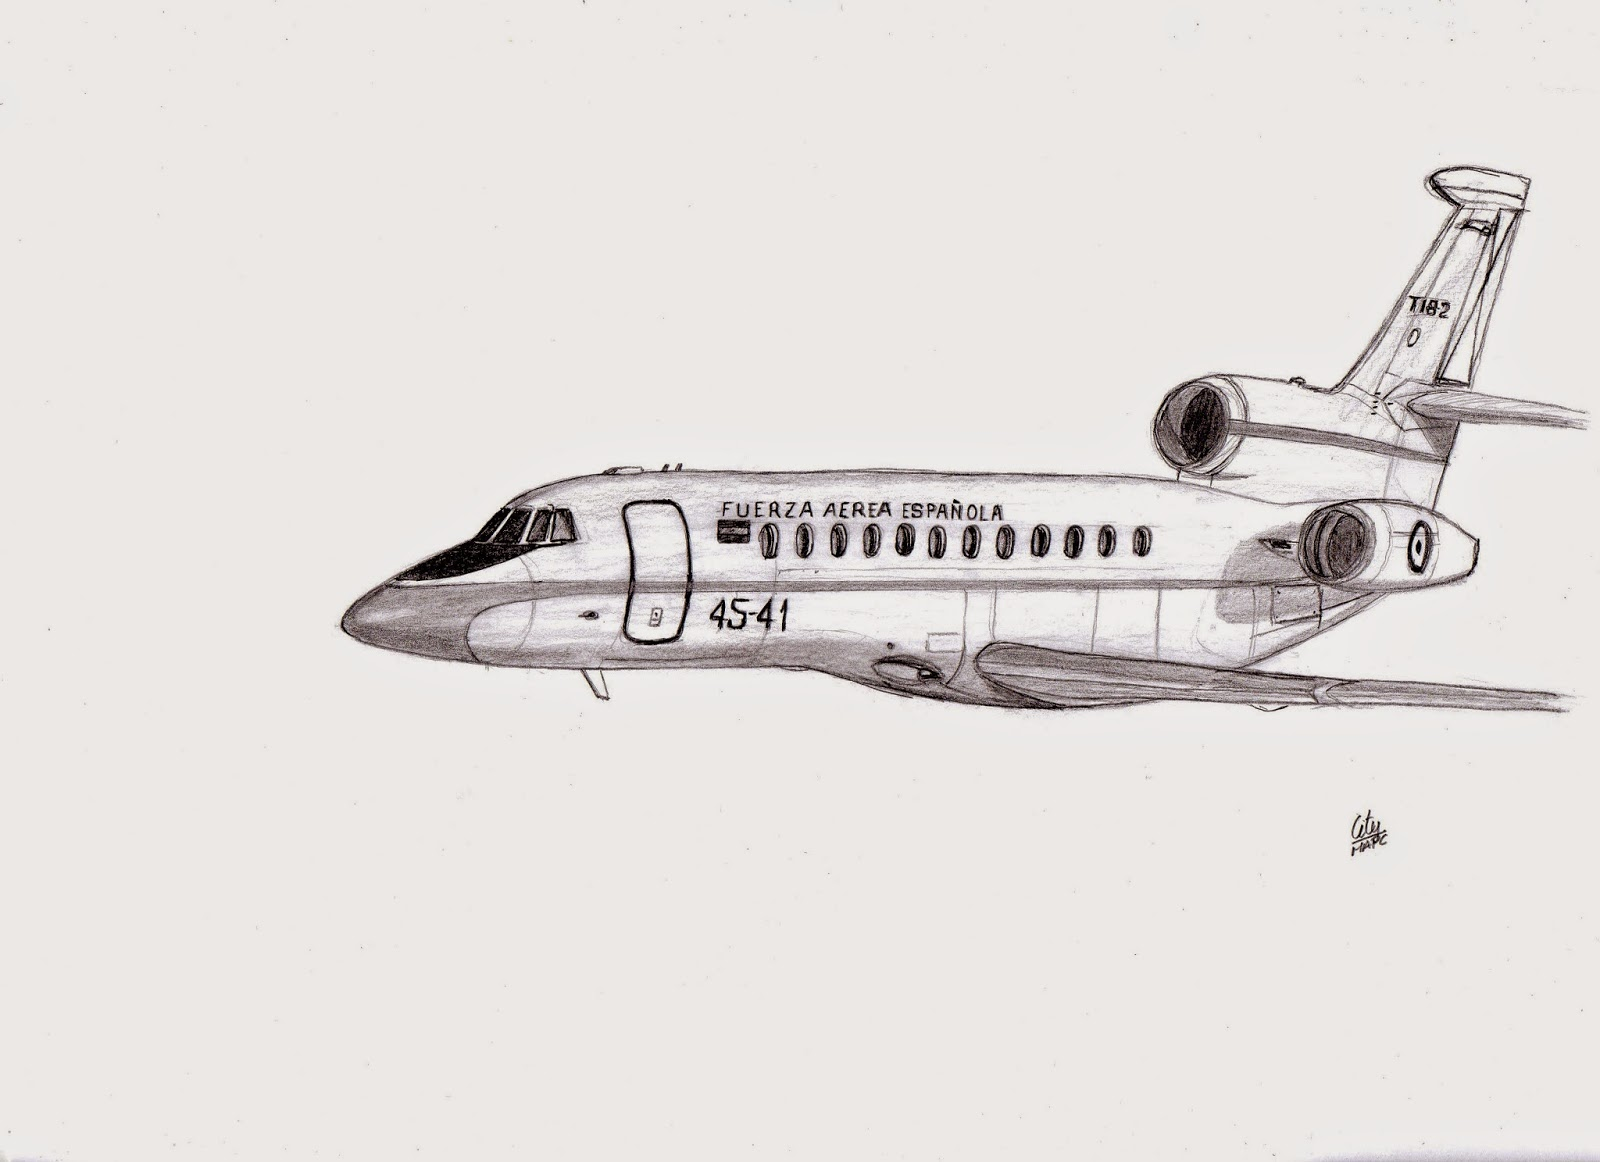 Dassault Falcon 900B. Grupo 45 de Fuerzas Aéreas. T.18-2